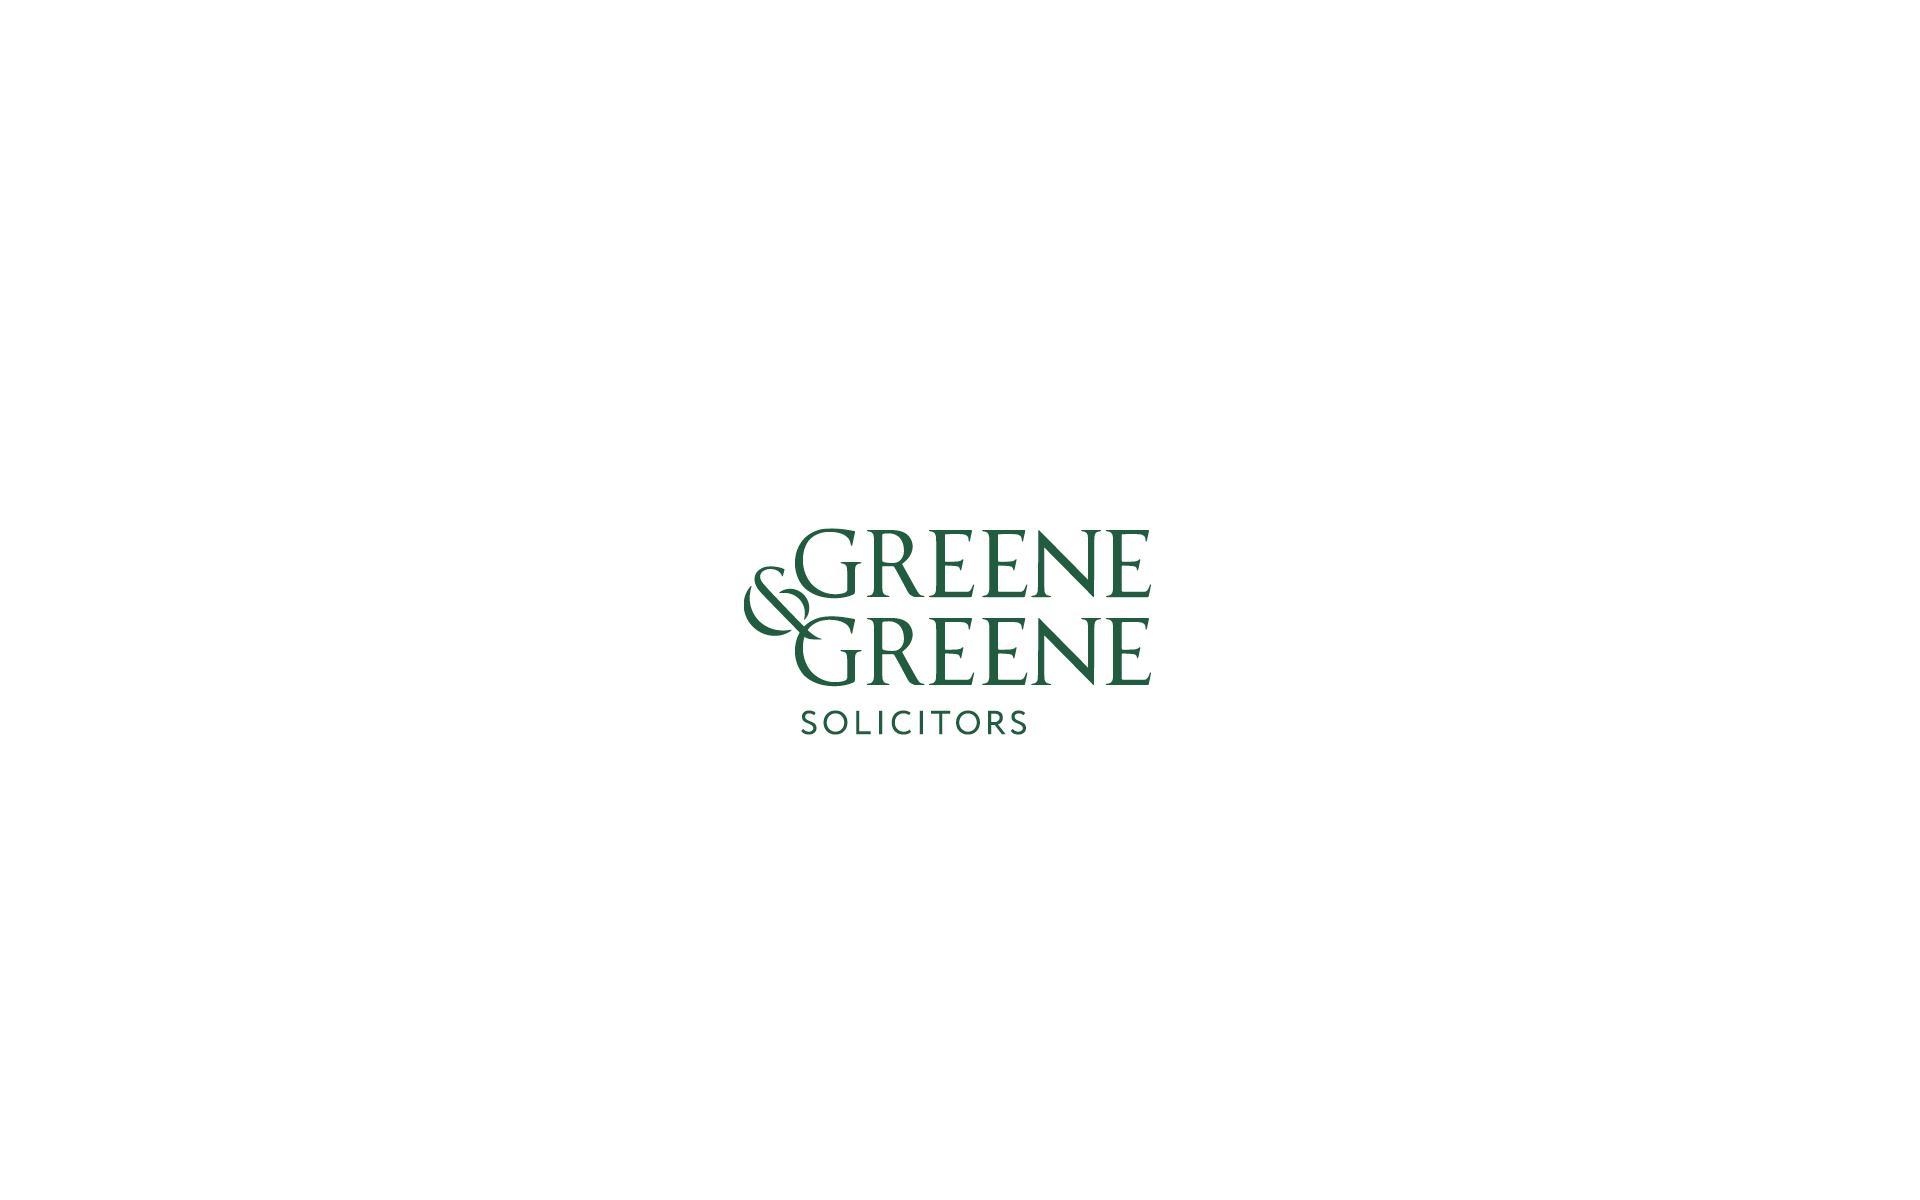 Greene & Greene stacked logo design